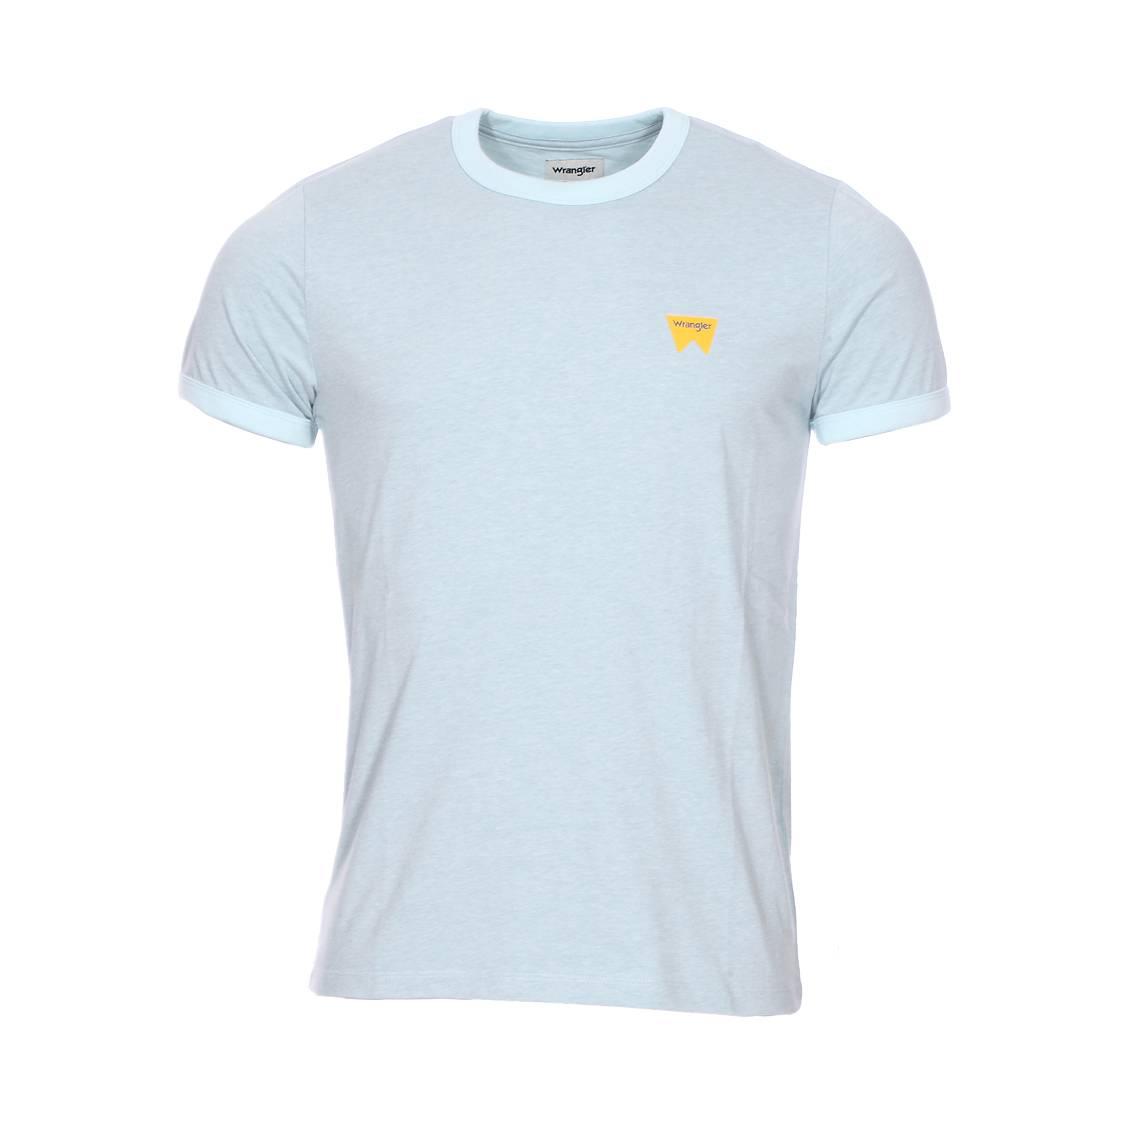 Tee-shirt col rond  sign off en coton mélangé bleu ciel chiné